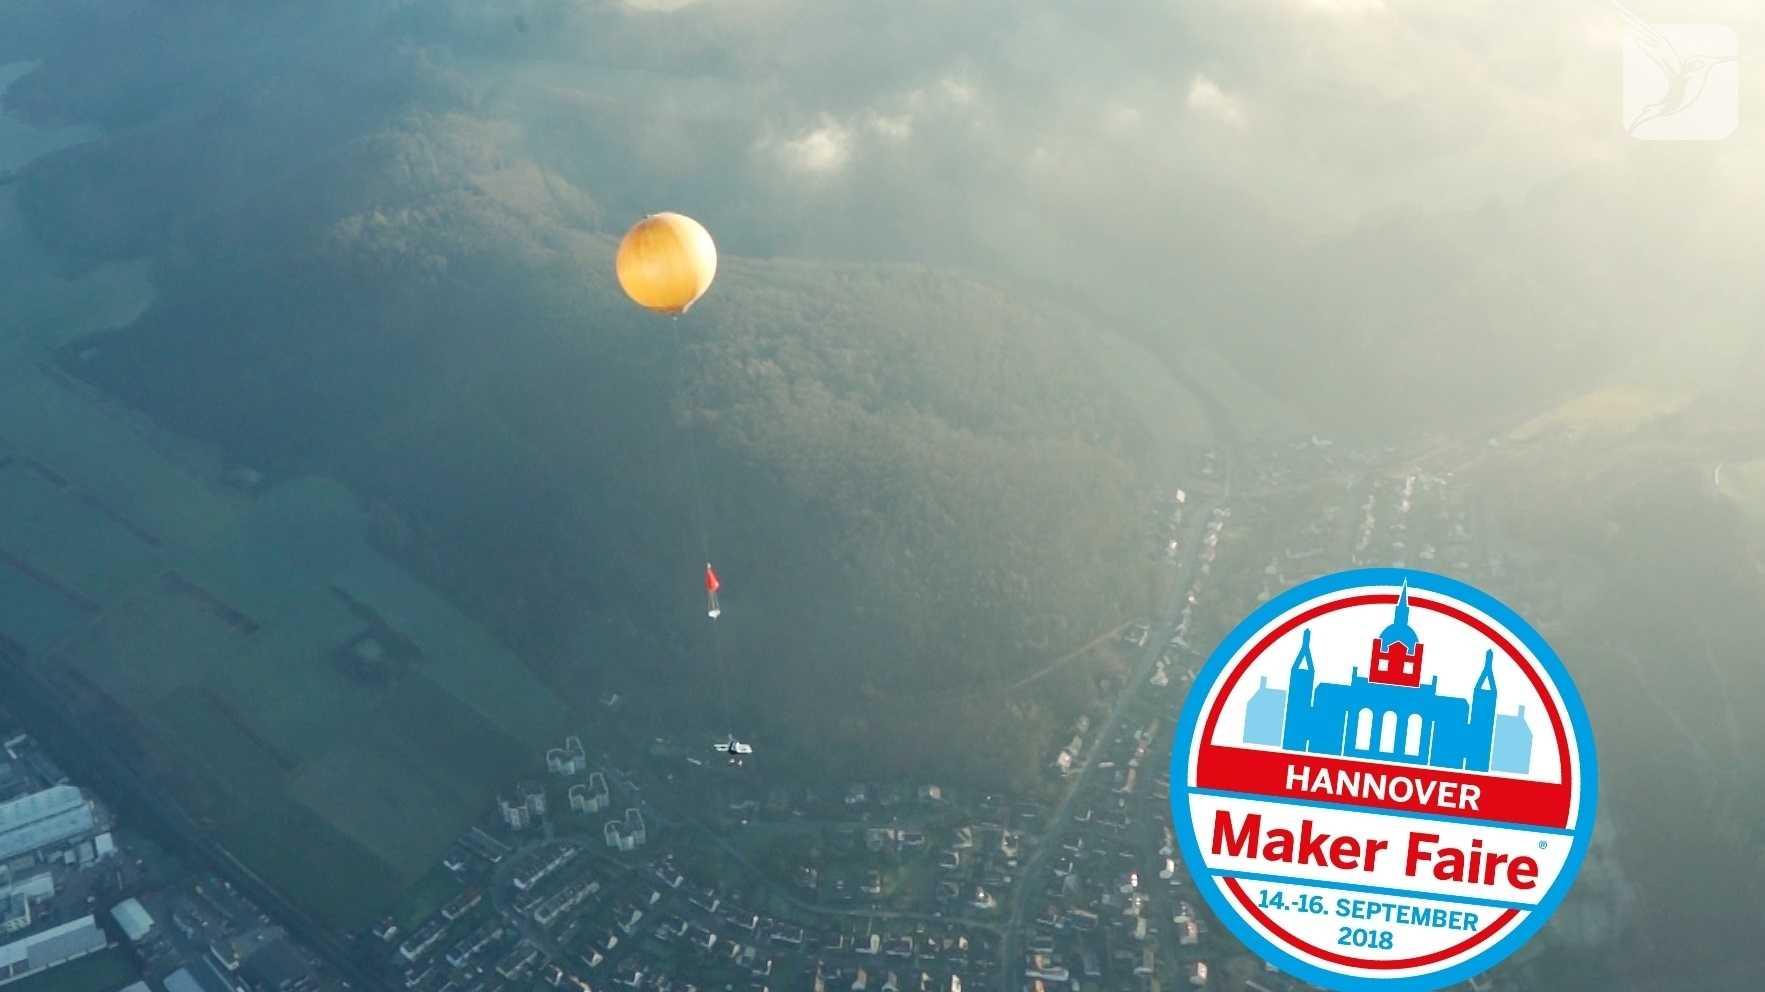 Maker Faire Hannover: Stratosphären Ballon bringt Experimente ins Weltall